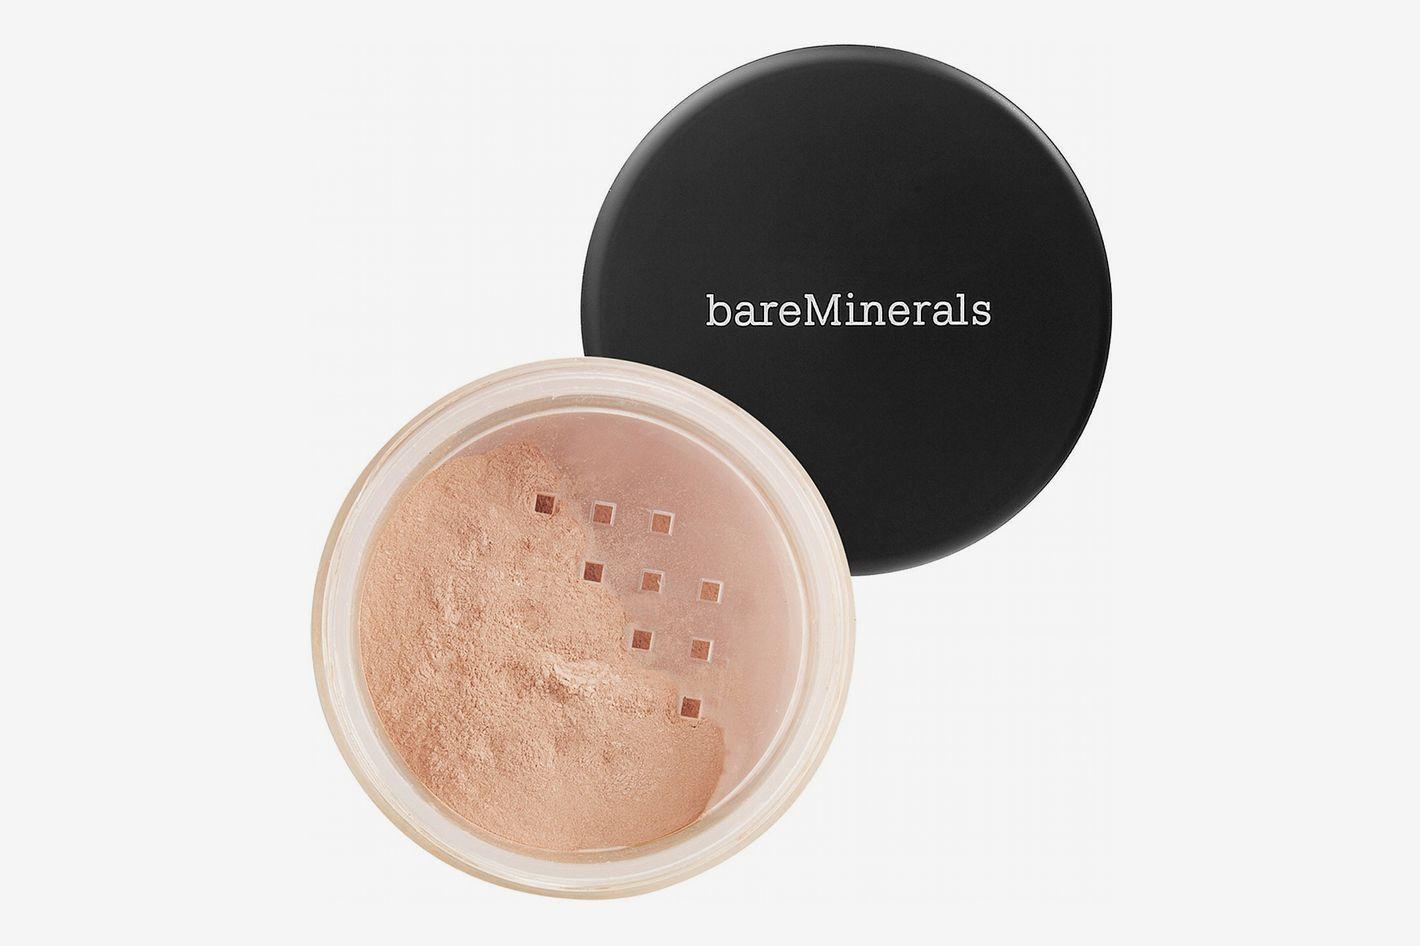 Bare Minerals Broad Spectrum Concealer